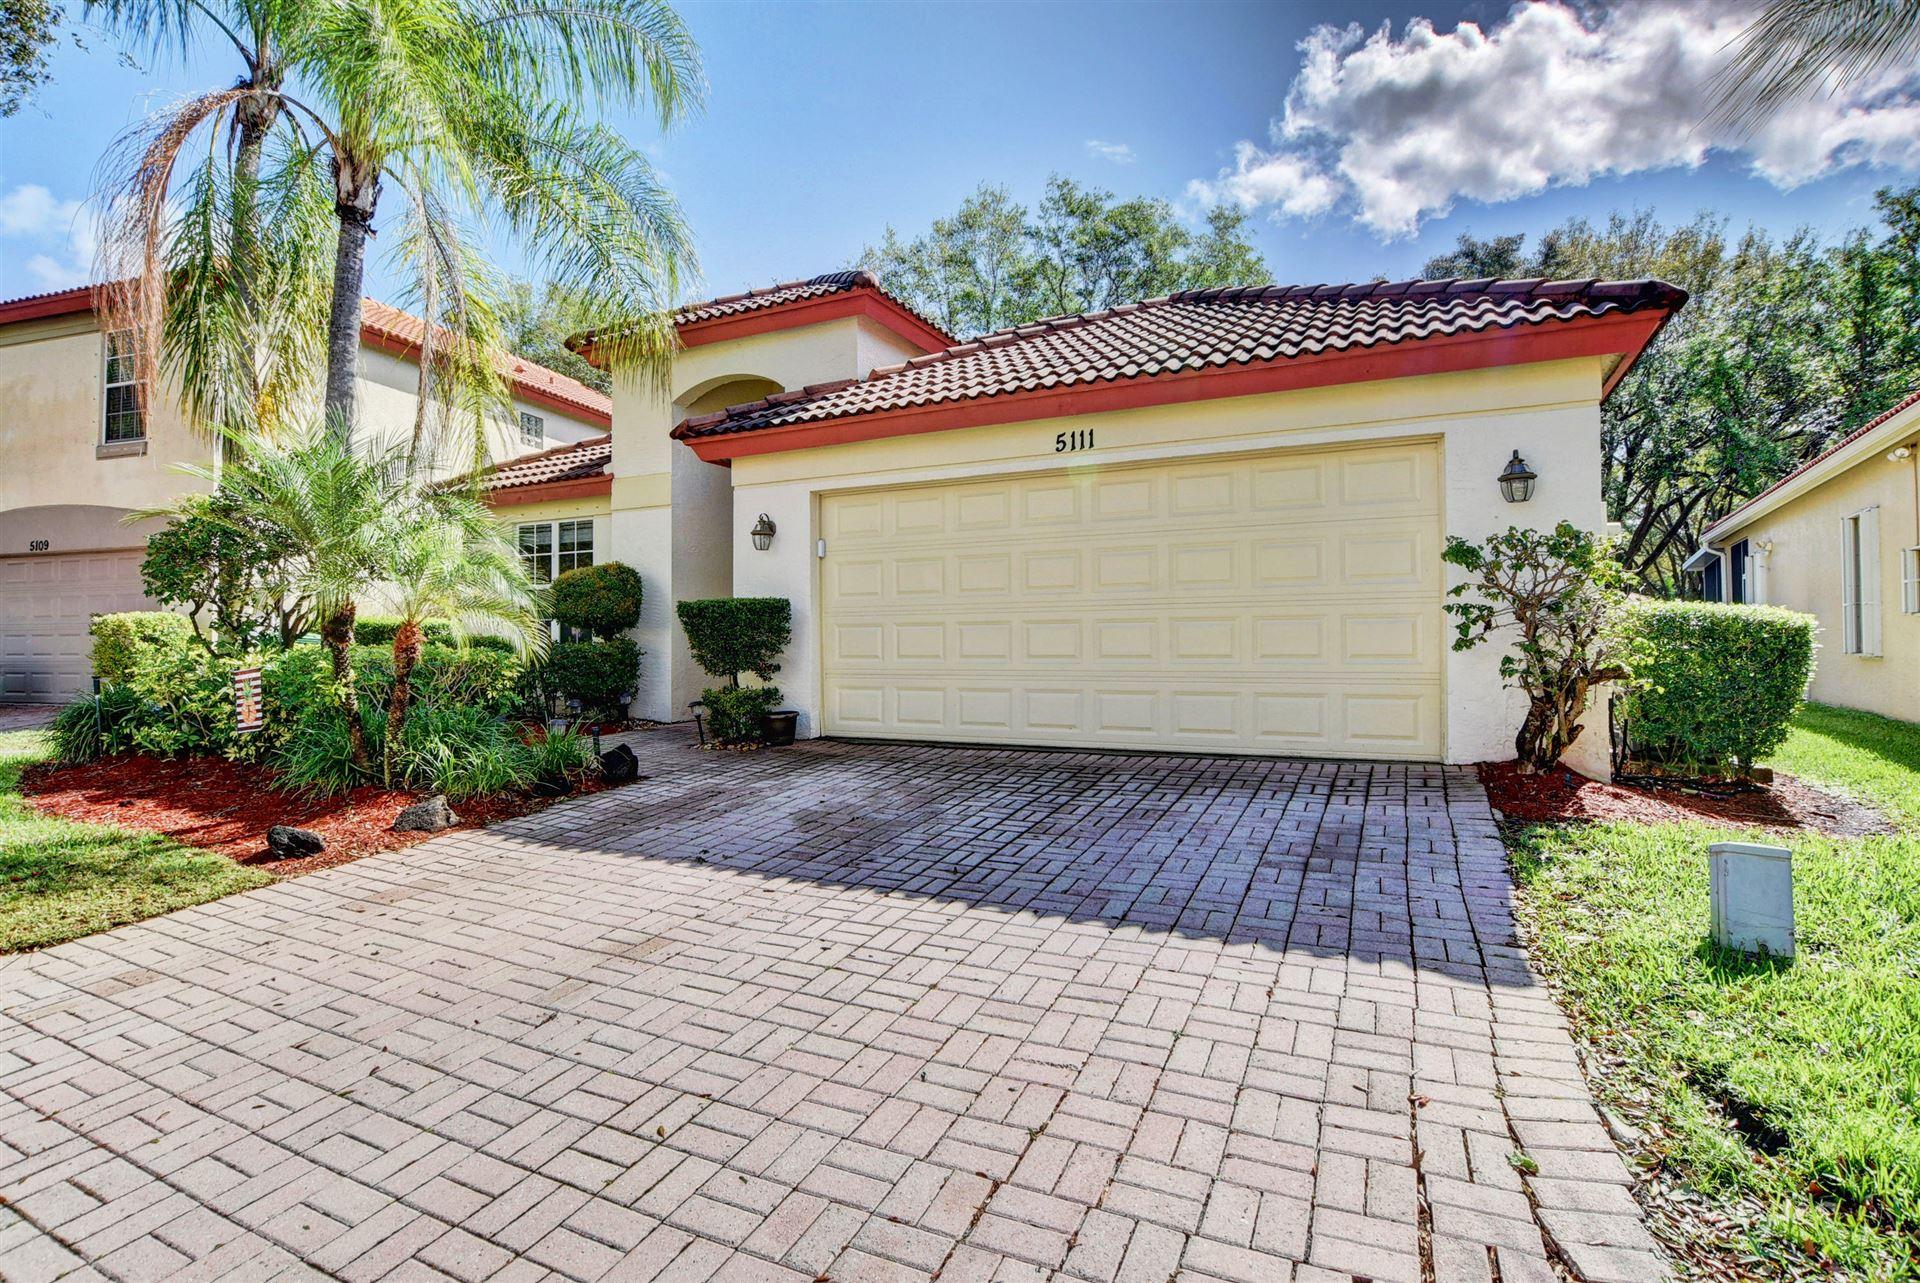 Photo of 5111 Elpine Way, Riviera Beach, FL 33418 (MLS # RX-10692520)